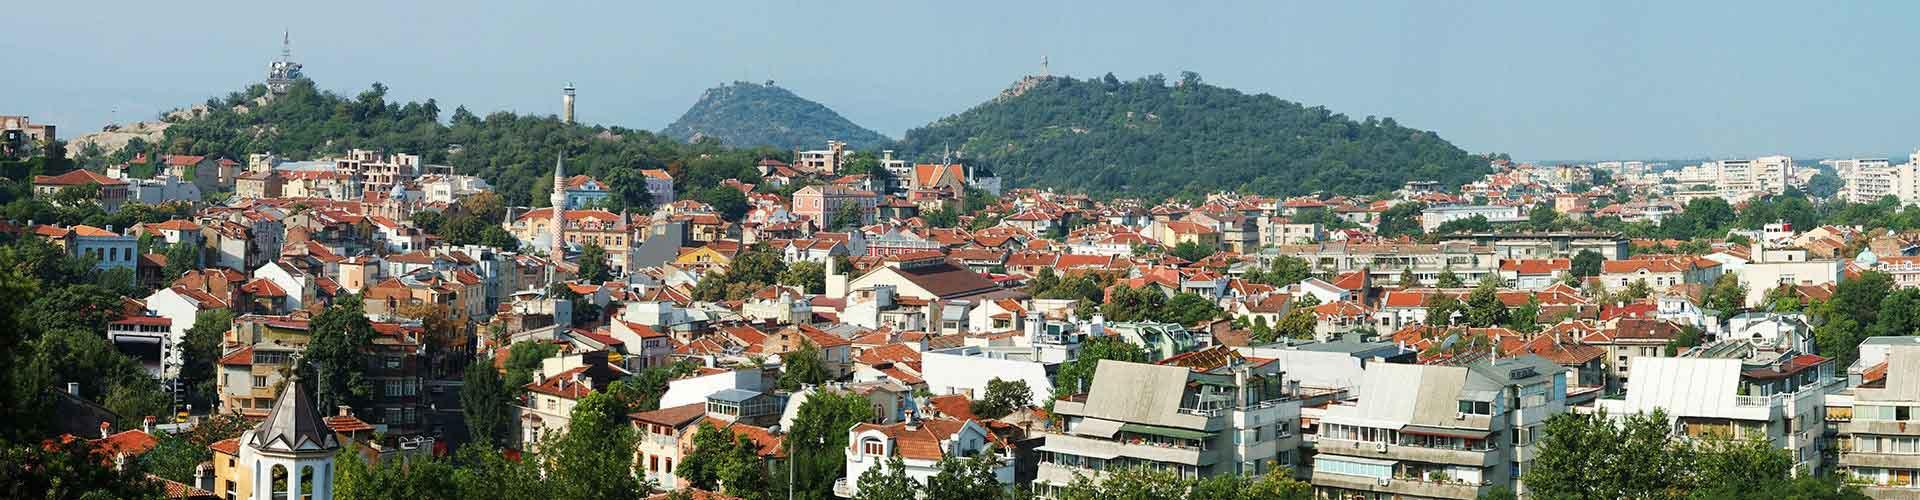 Plovdiv - Hostelů v Plovdiv. Mapy pro Plovdiv, fotky a recenze pro každý hostel v Plovdiv.